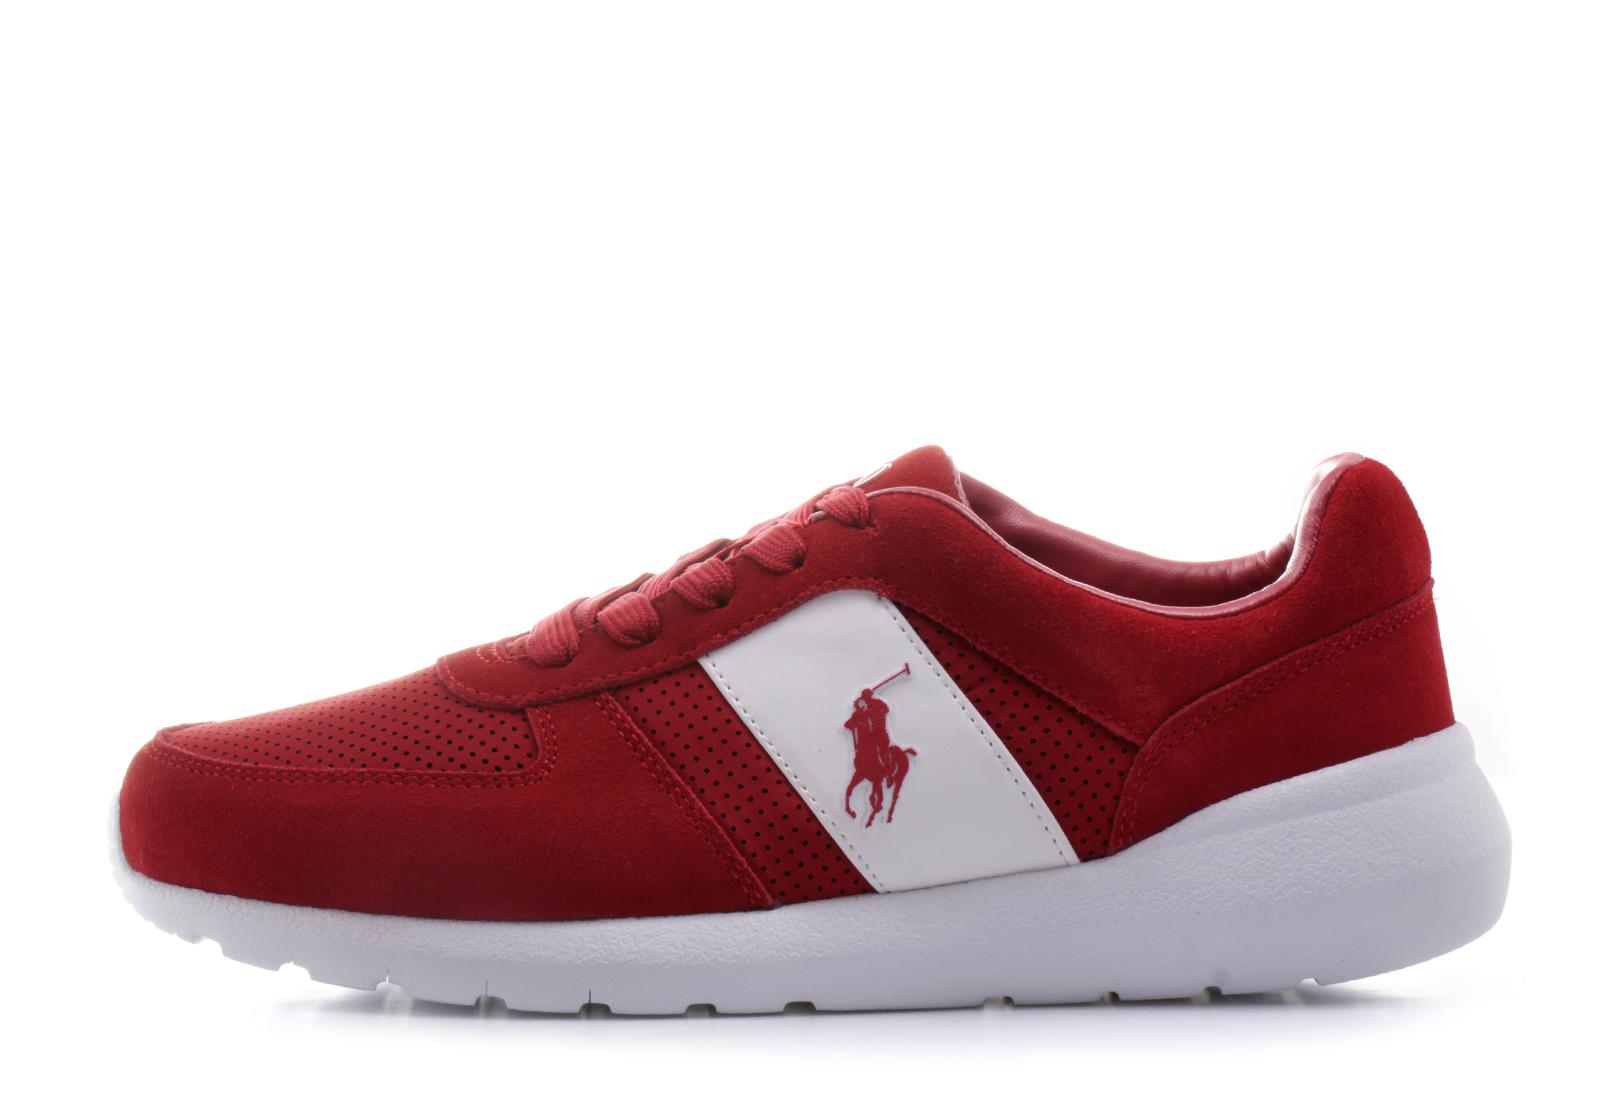 Polo Ralph Lauren Cipő - Cordell - 816664690004 - Office Shoes ... 1d8be1ac98